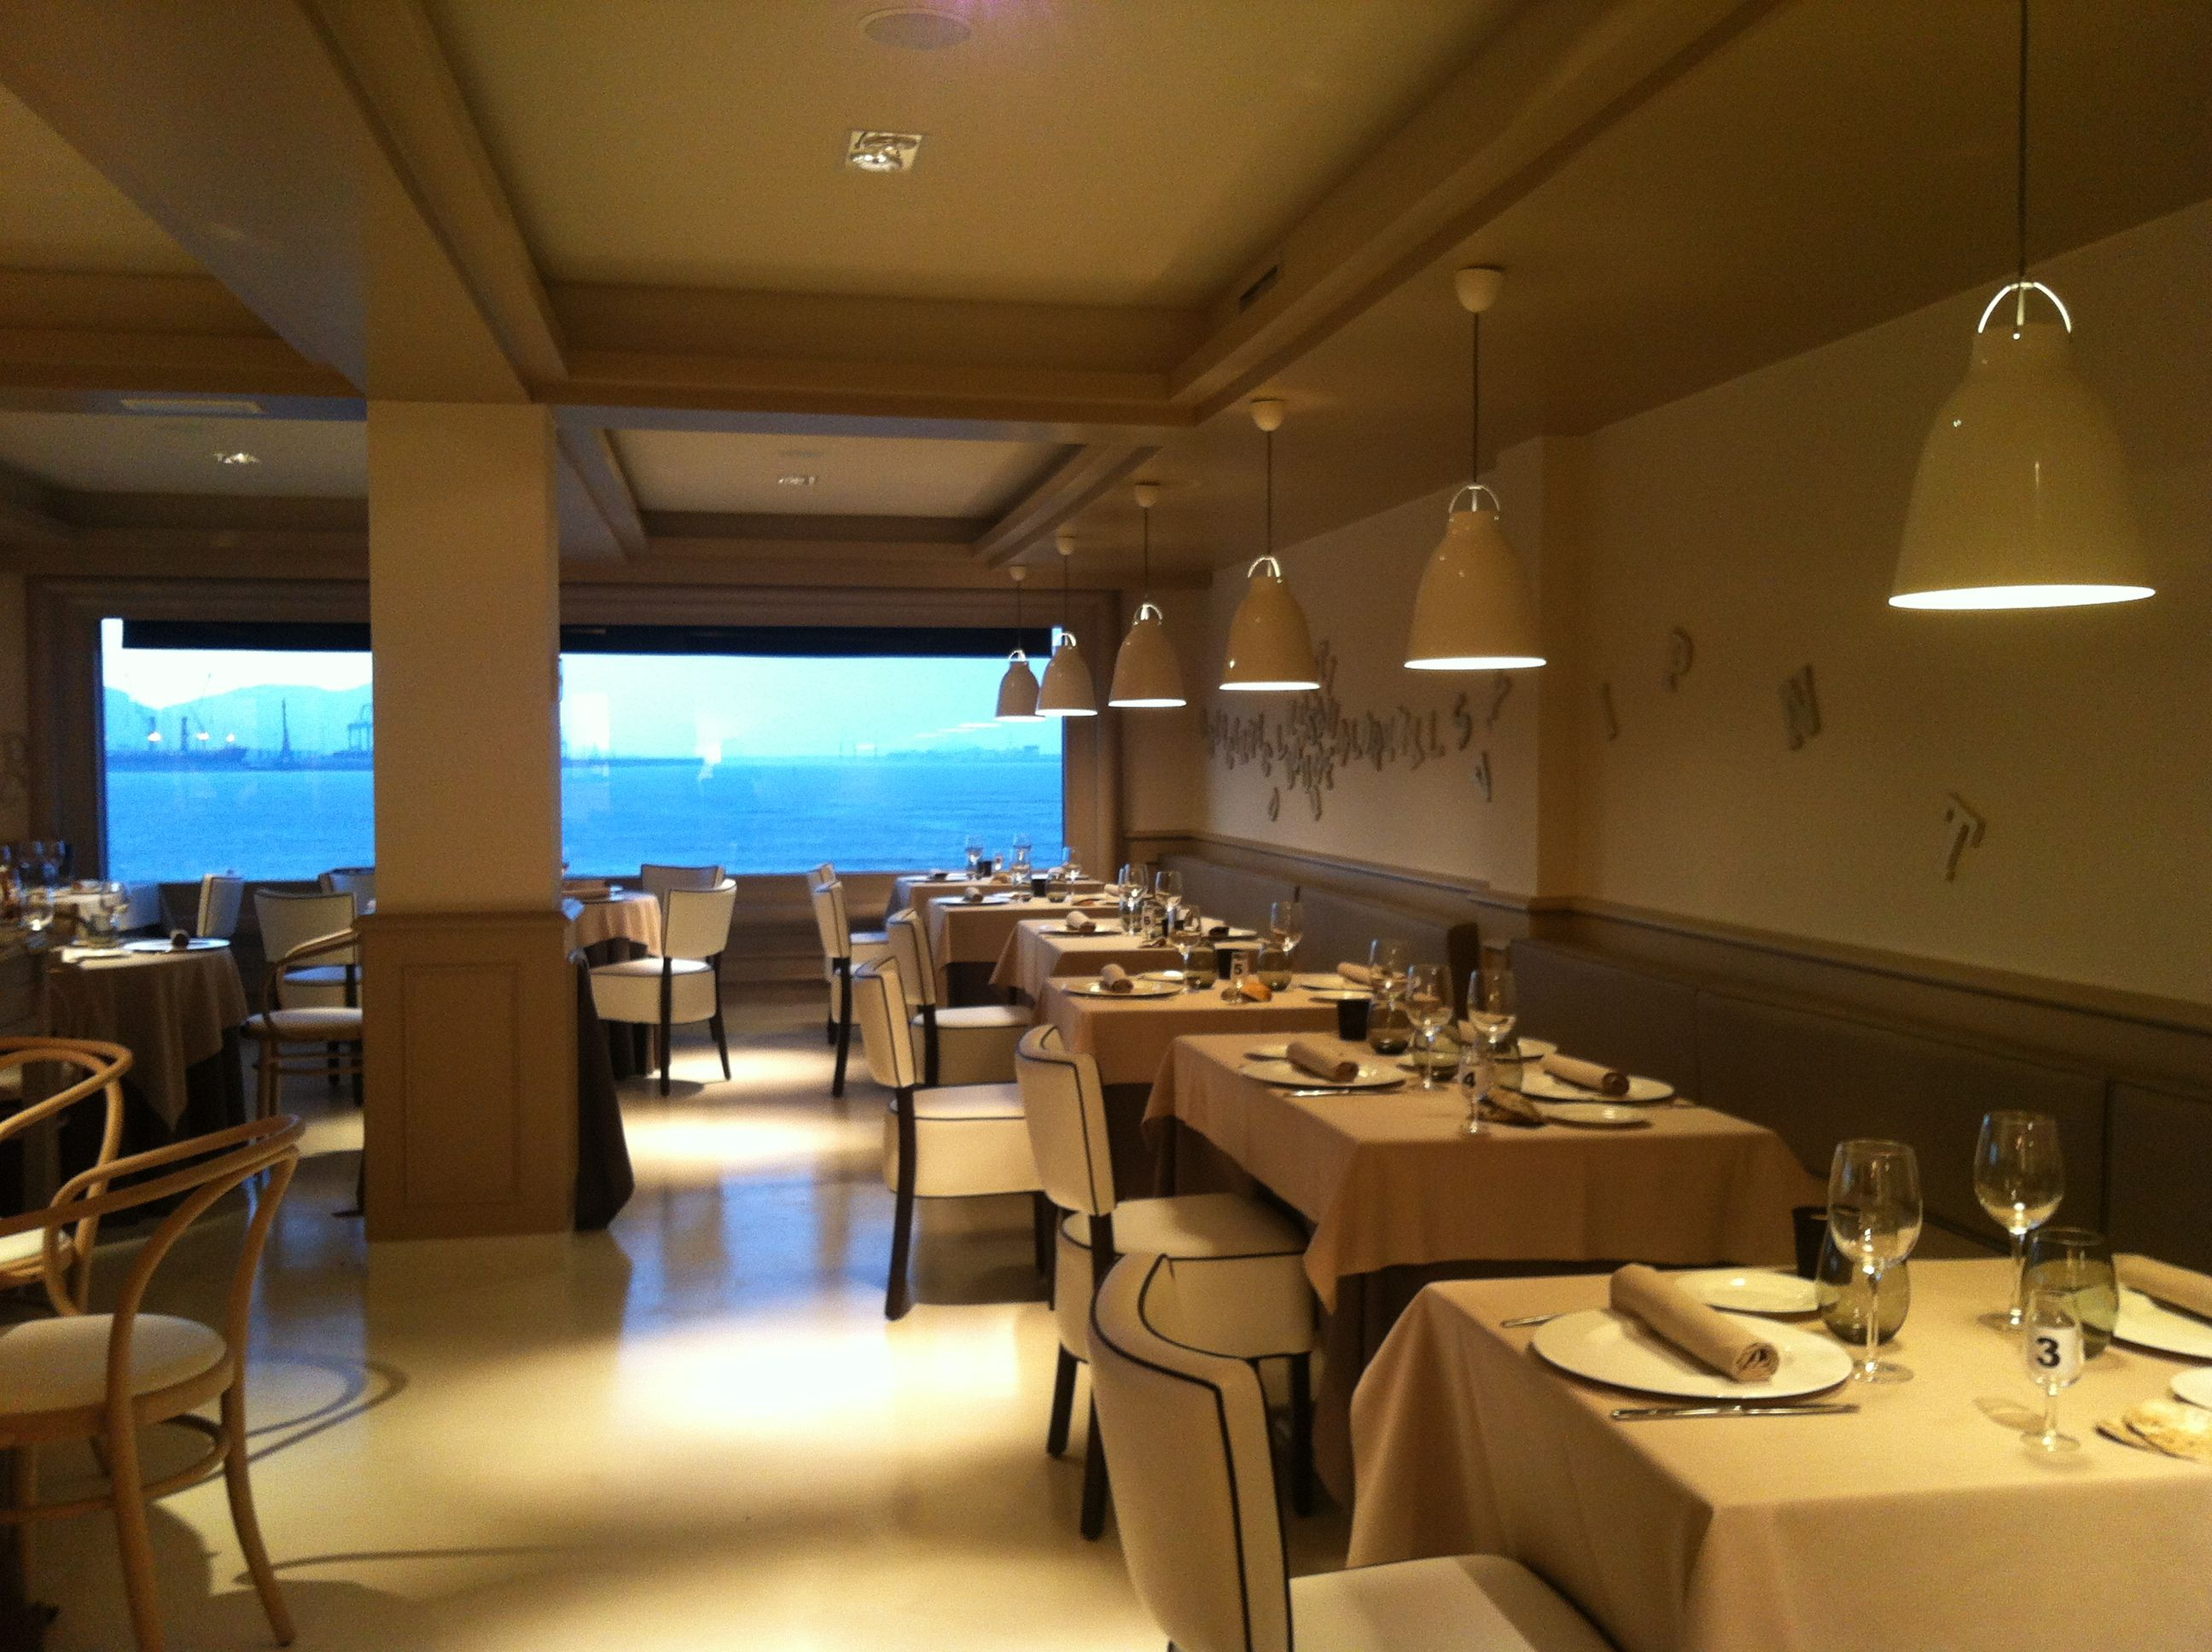 Restaurante Tamarises Ereaga Bizkaia Basque Country Favorite  # Muebles Bizkaia Guenes